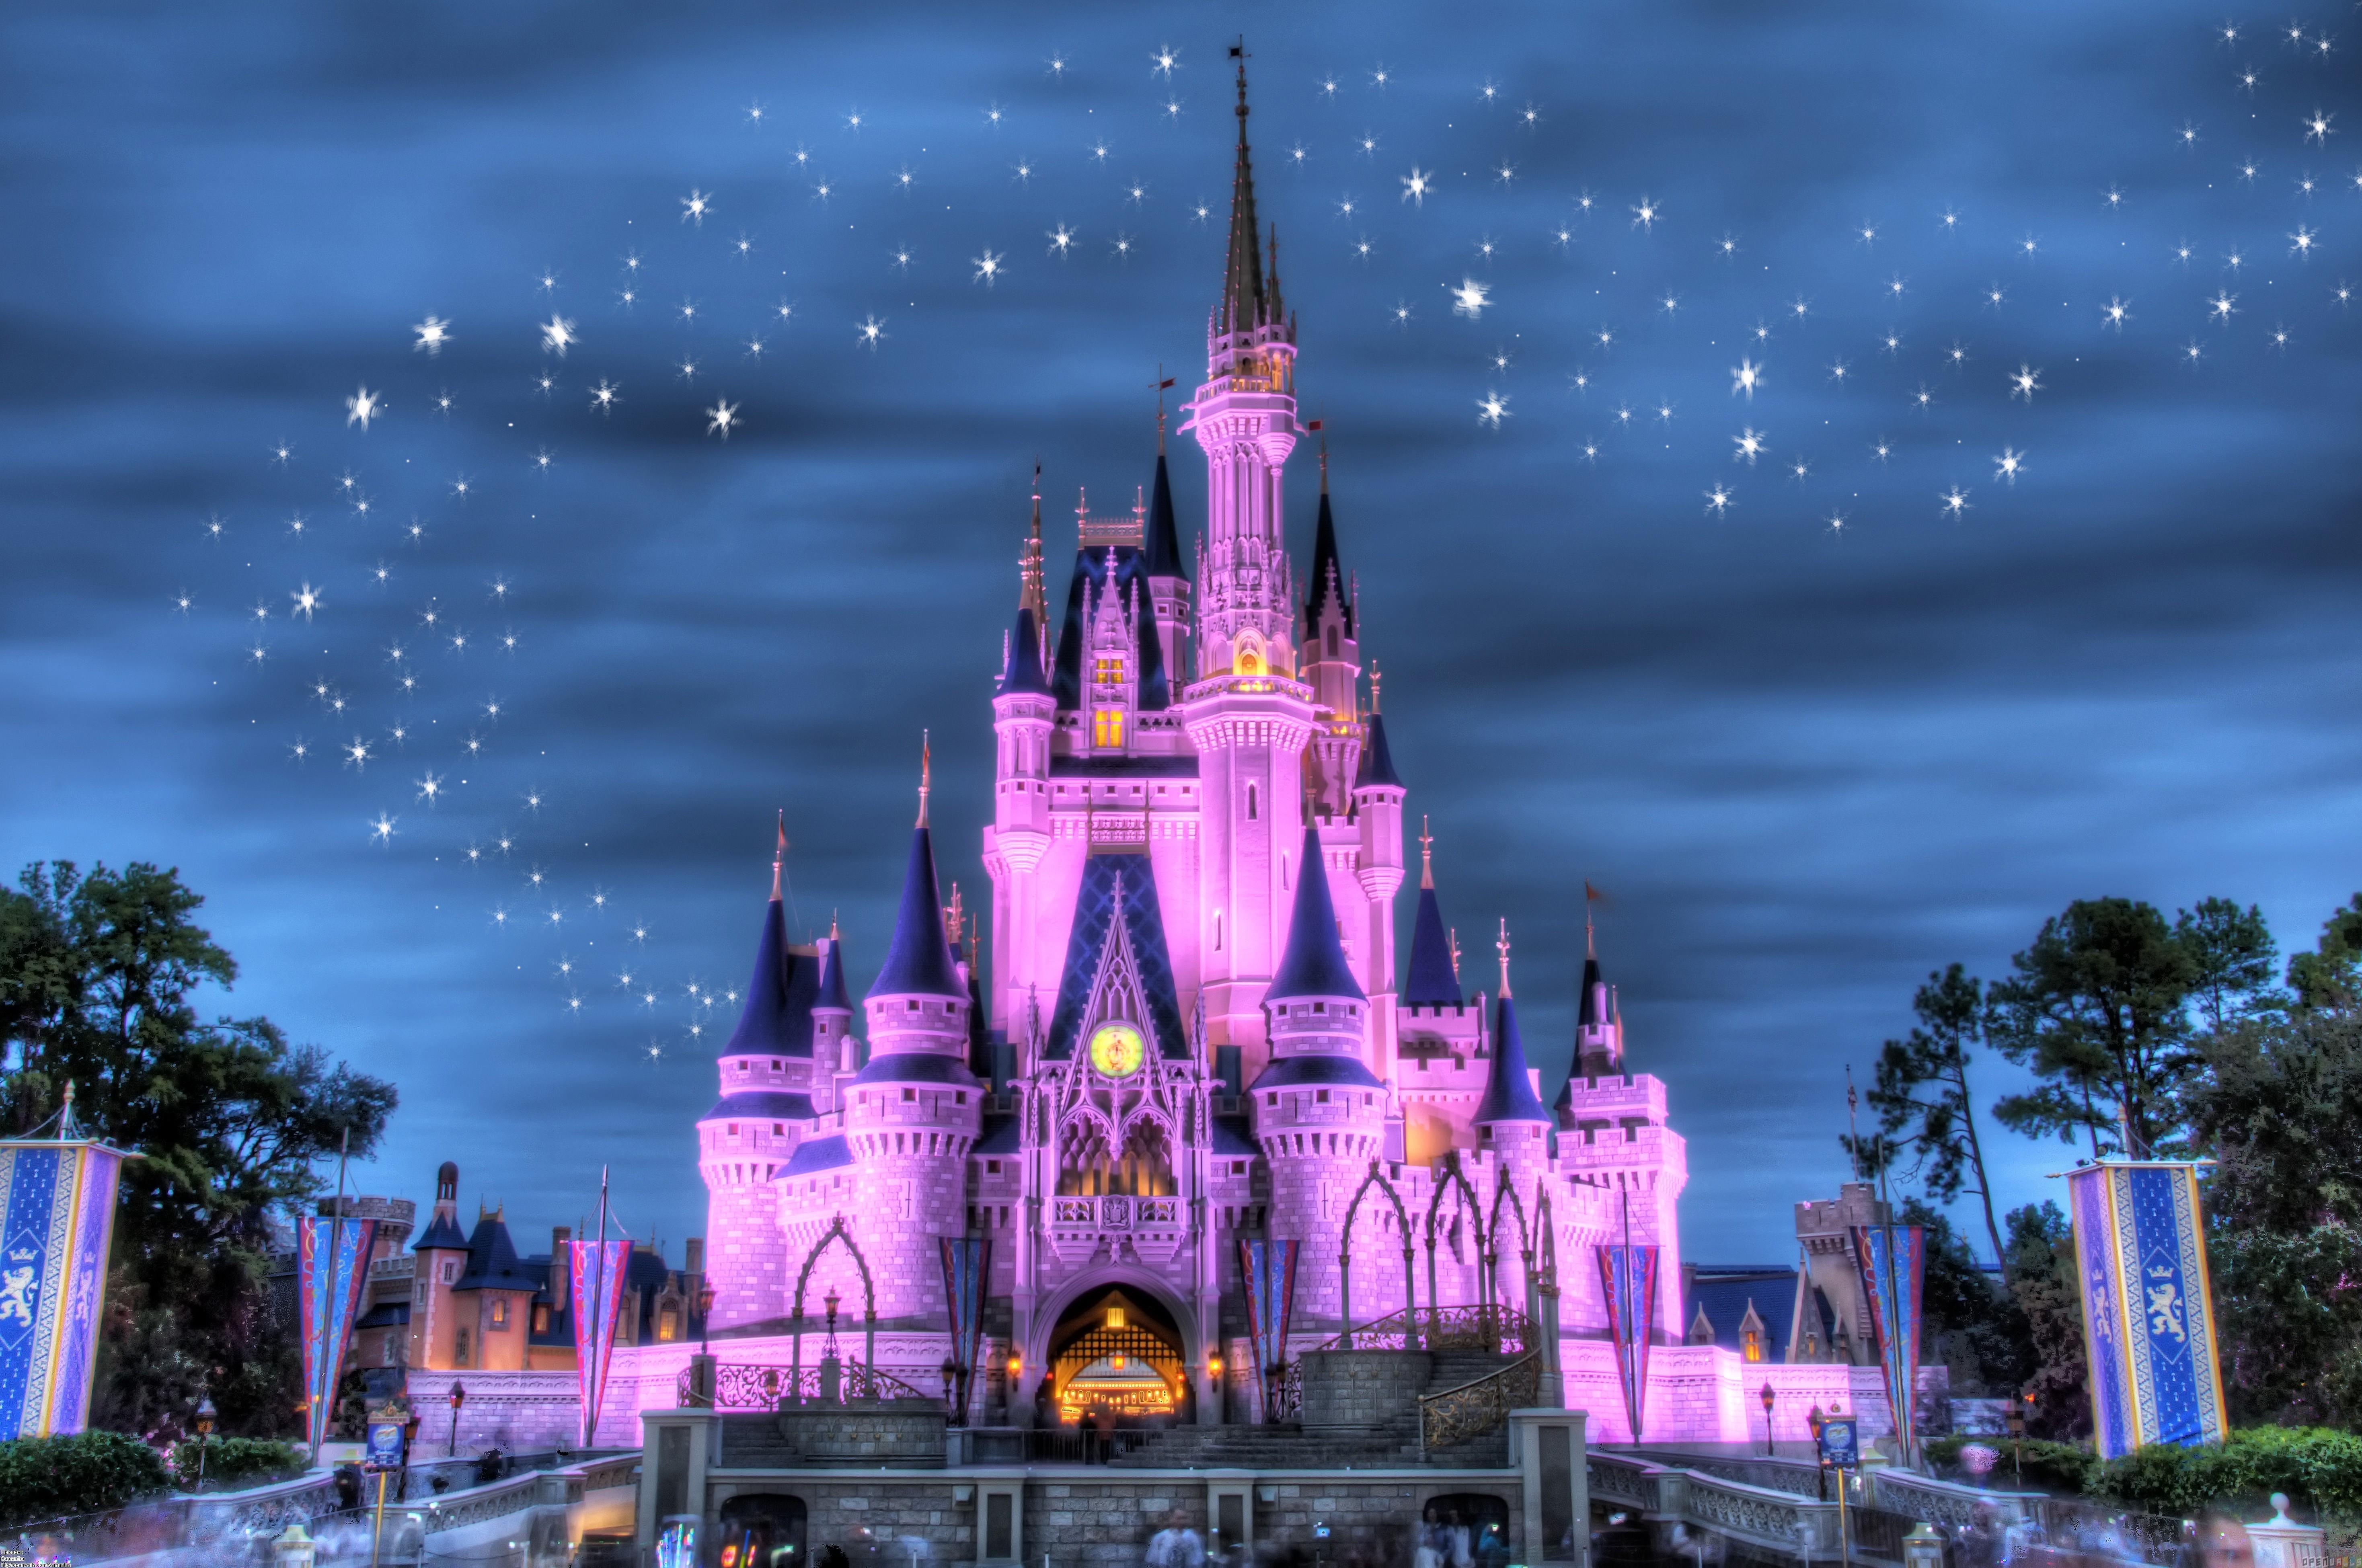 Disney castle background wallpapersafari for Disney castle mural wallpaper